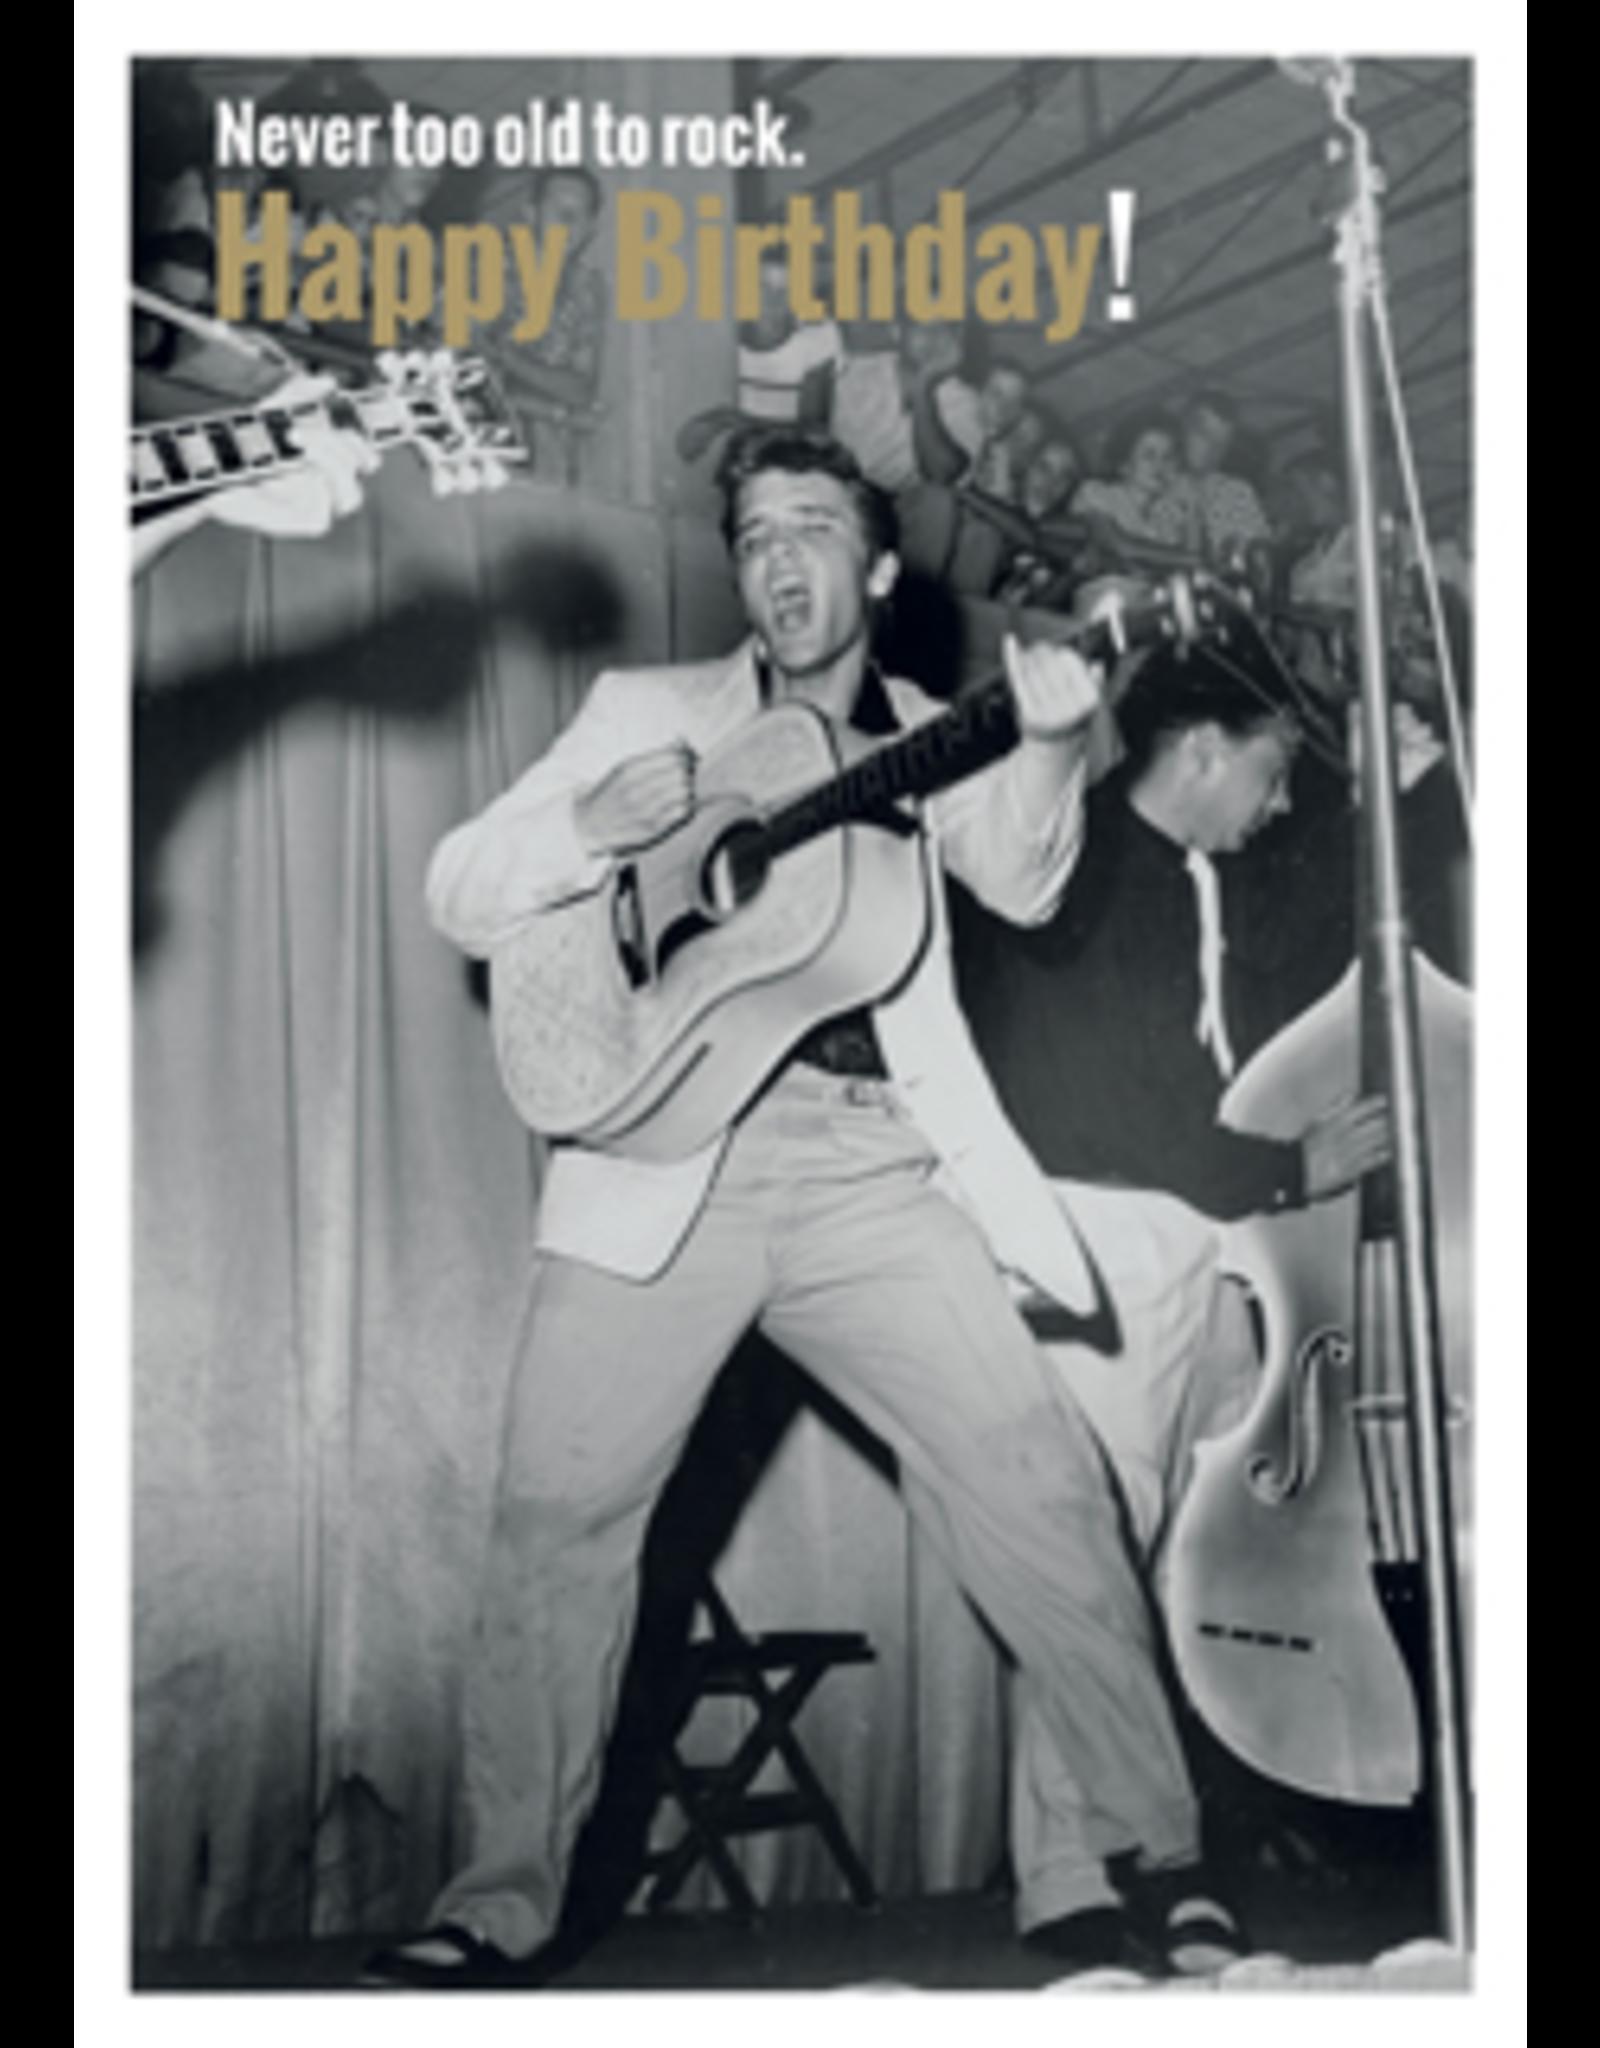 Elvis Presley card - happy birthday!